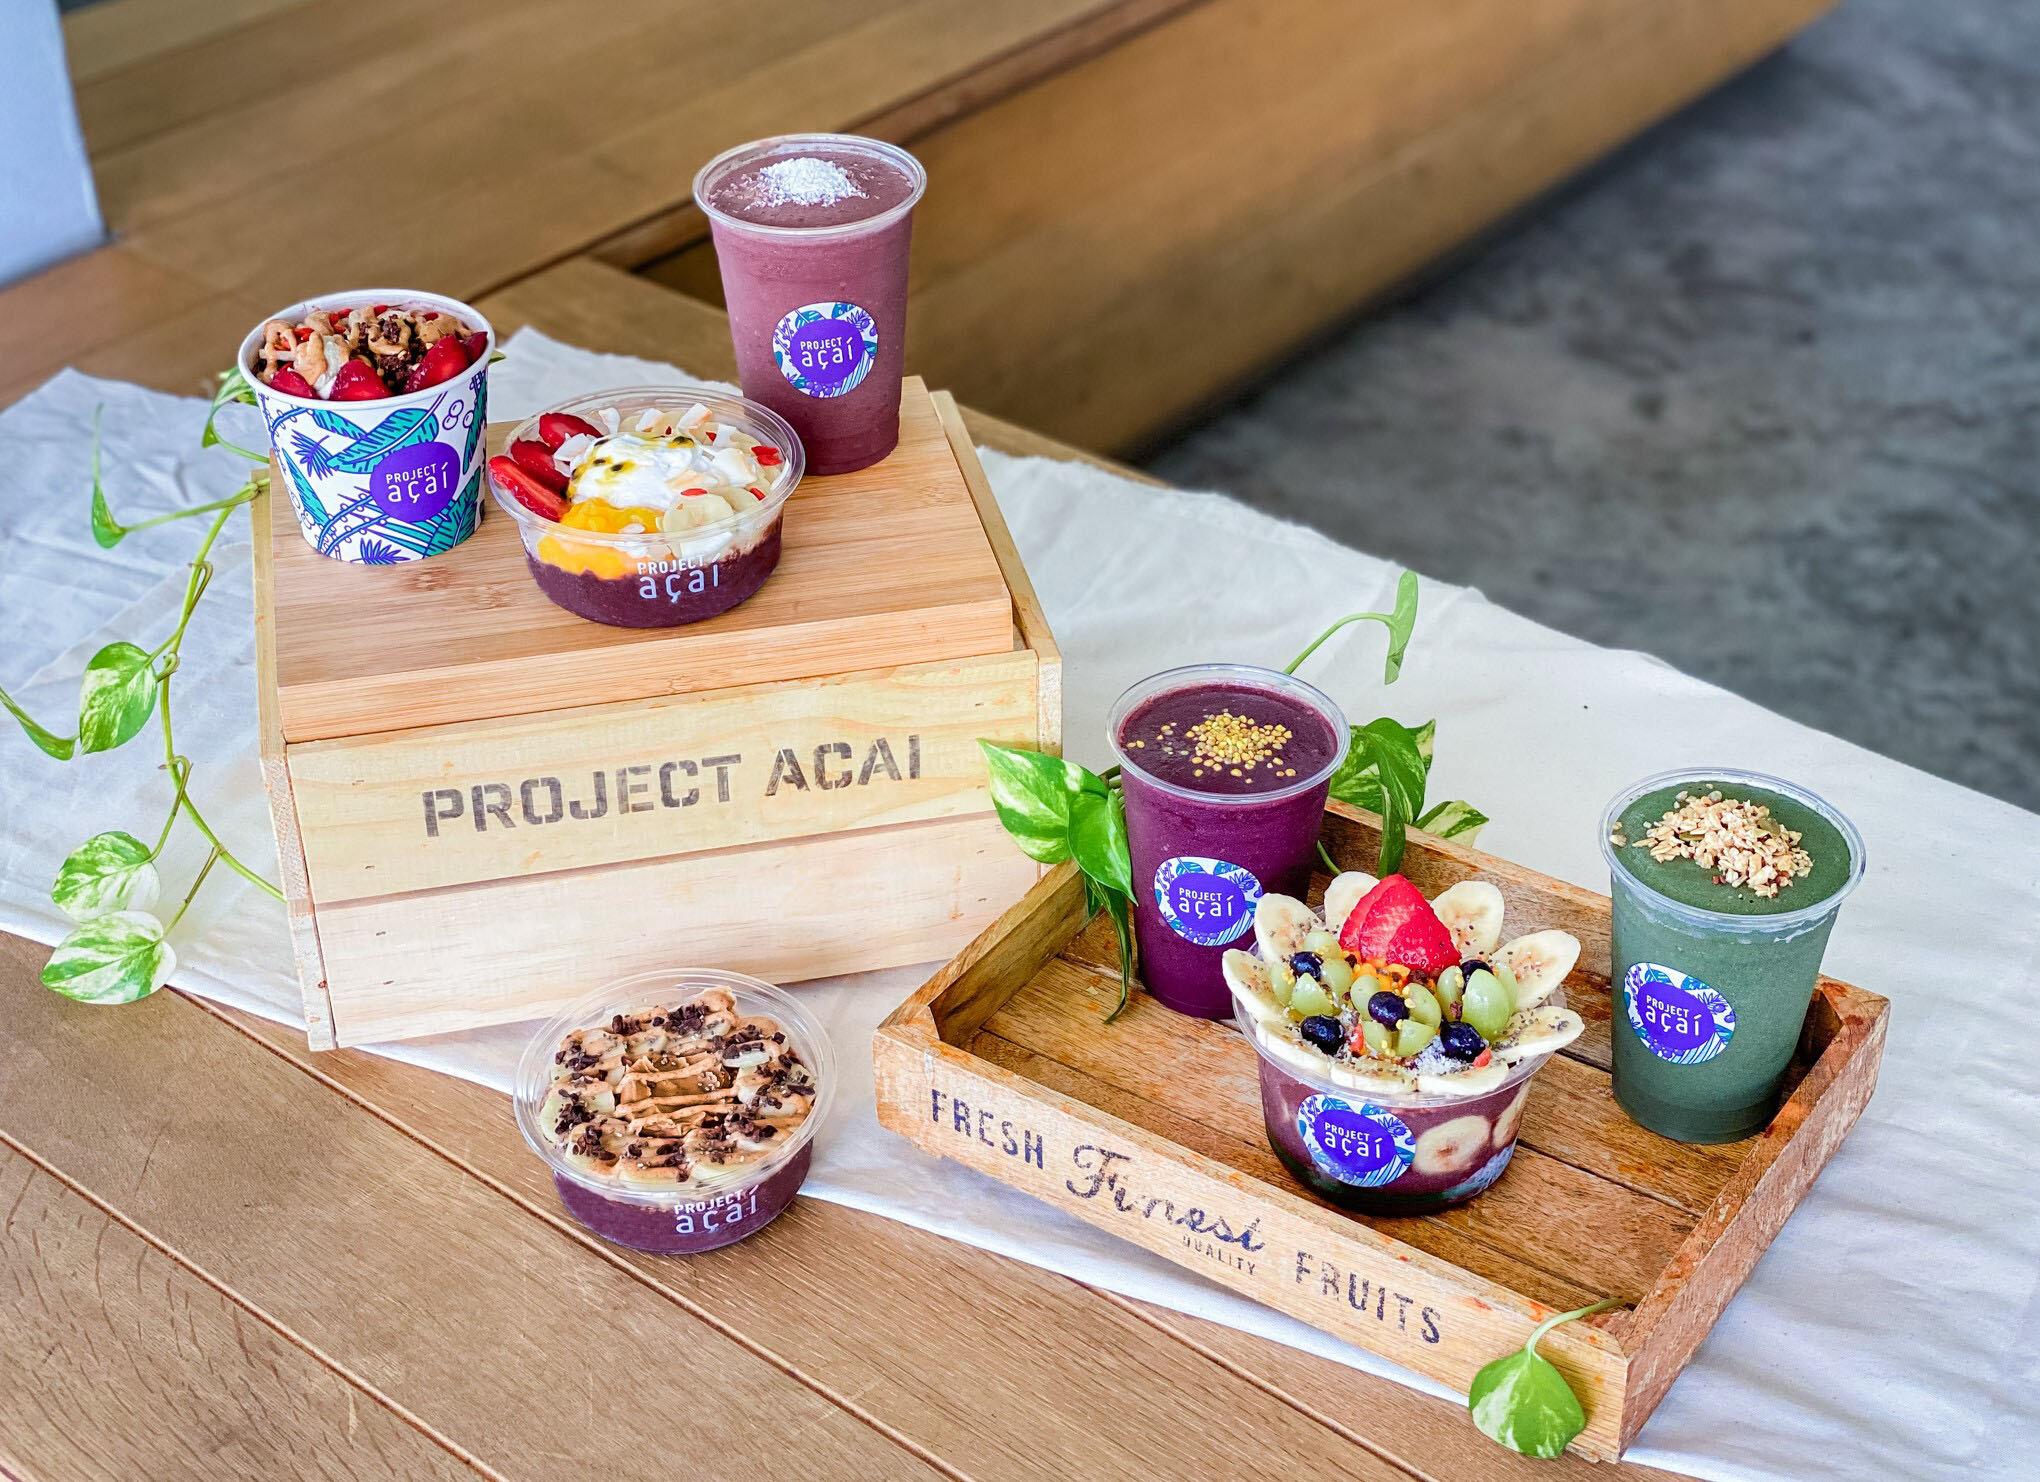 Project Açaí is one of Singapore's first dedicated açaí cafes.